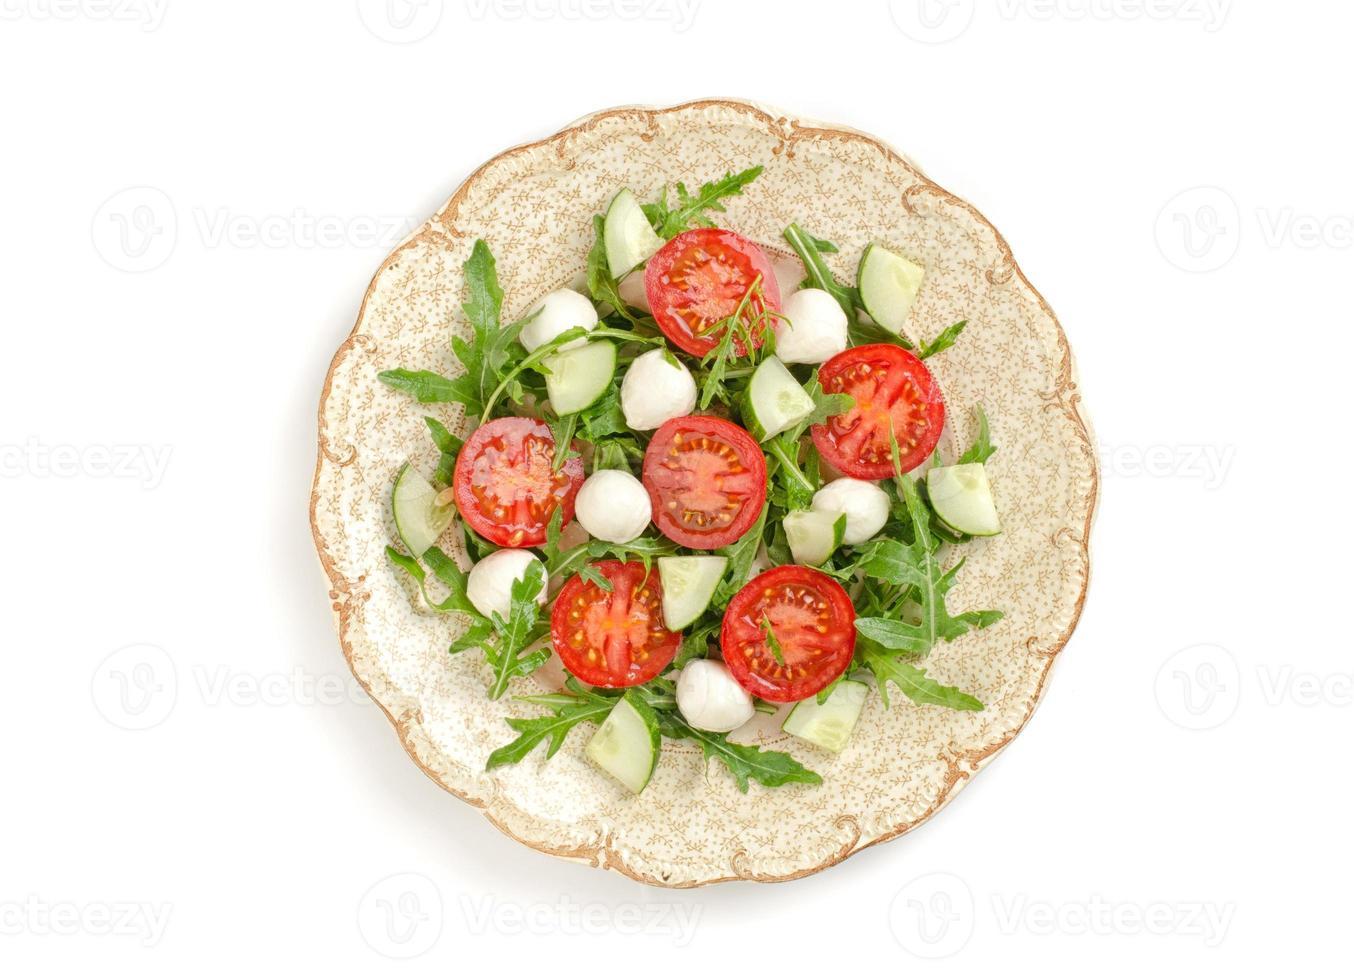 salade met tomaten en mozzarella foto